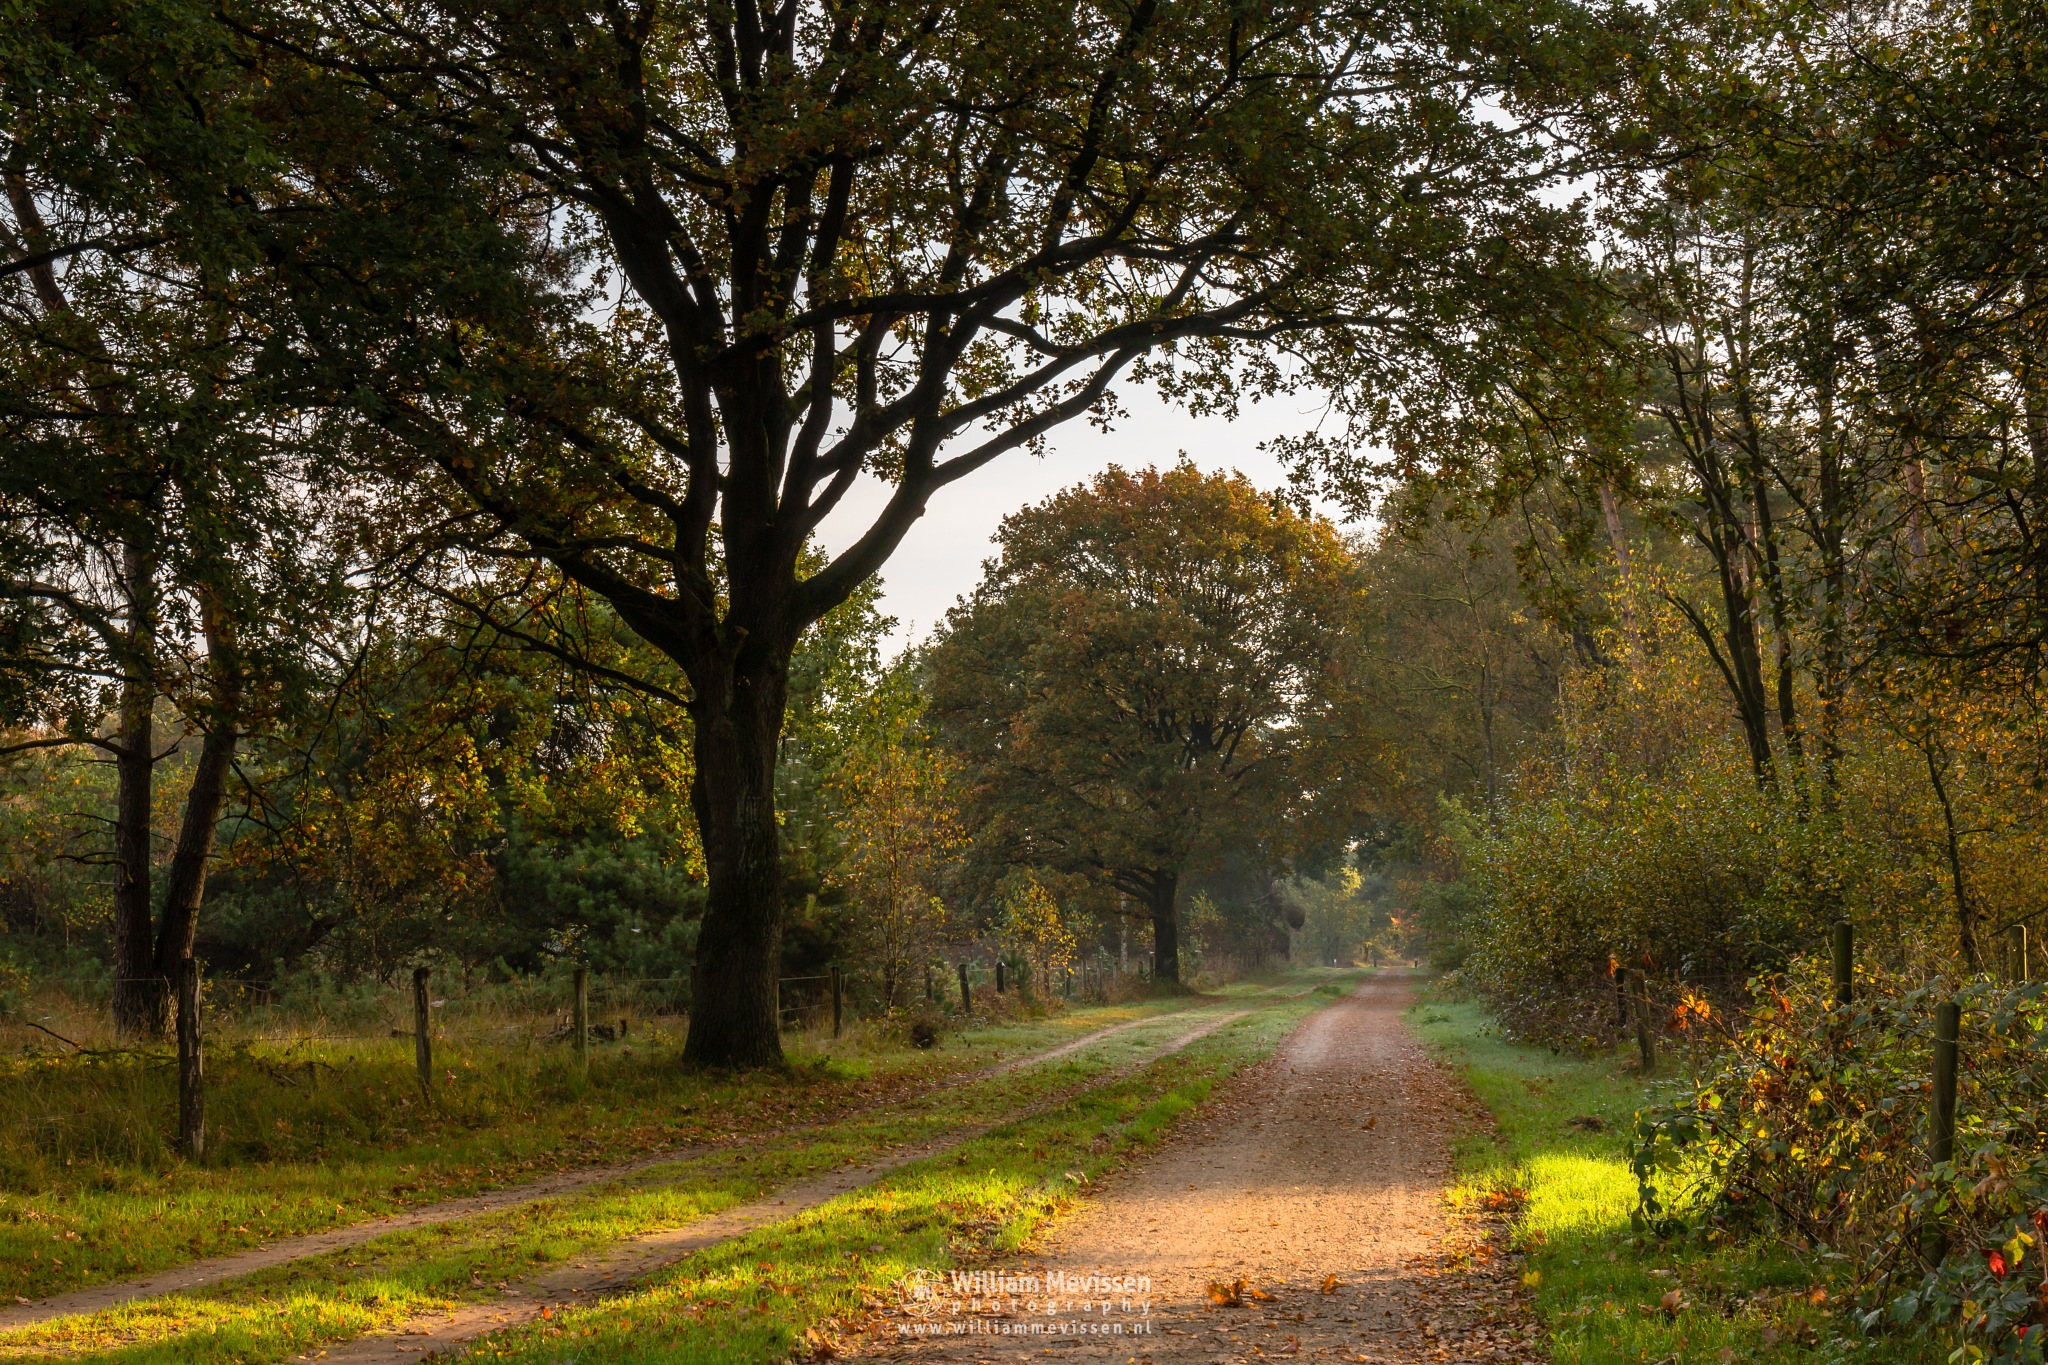 Autumn Path Sunlight by William Mevissen